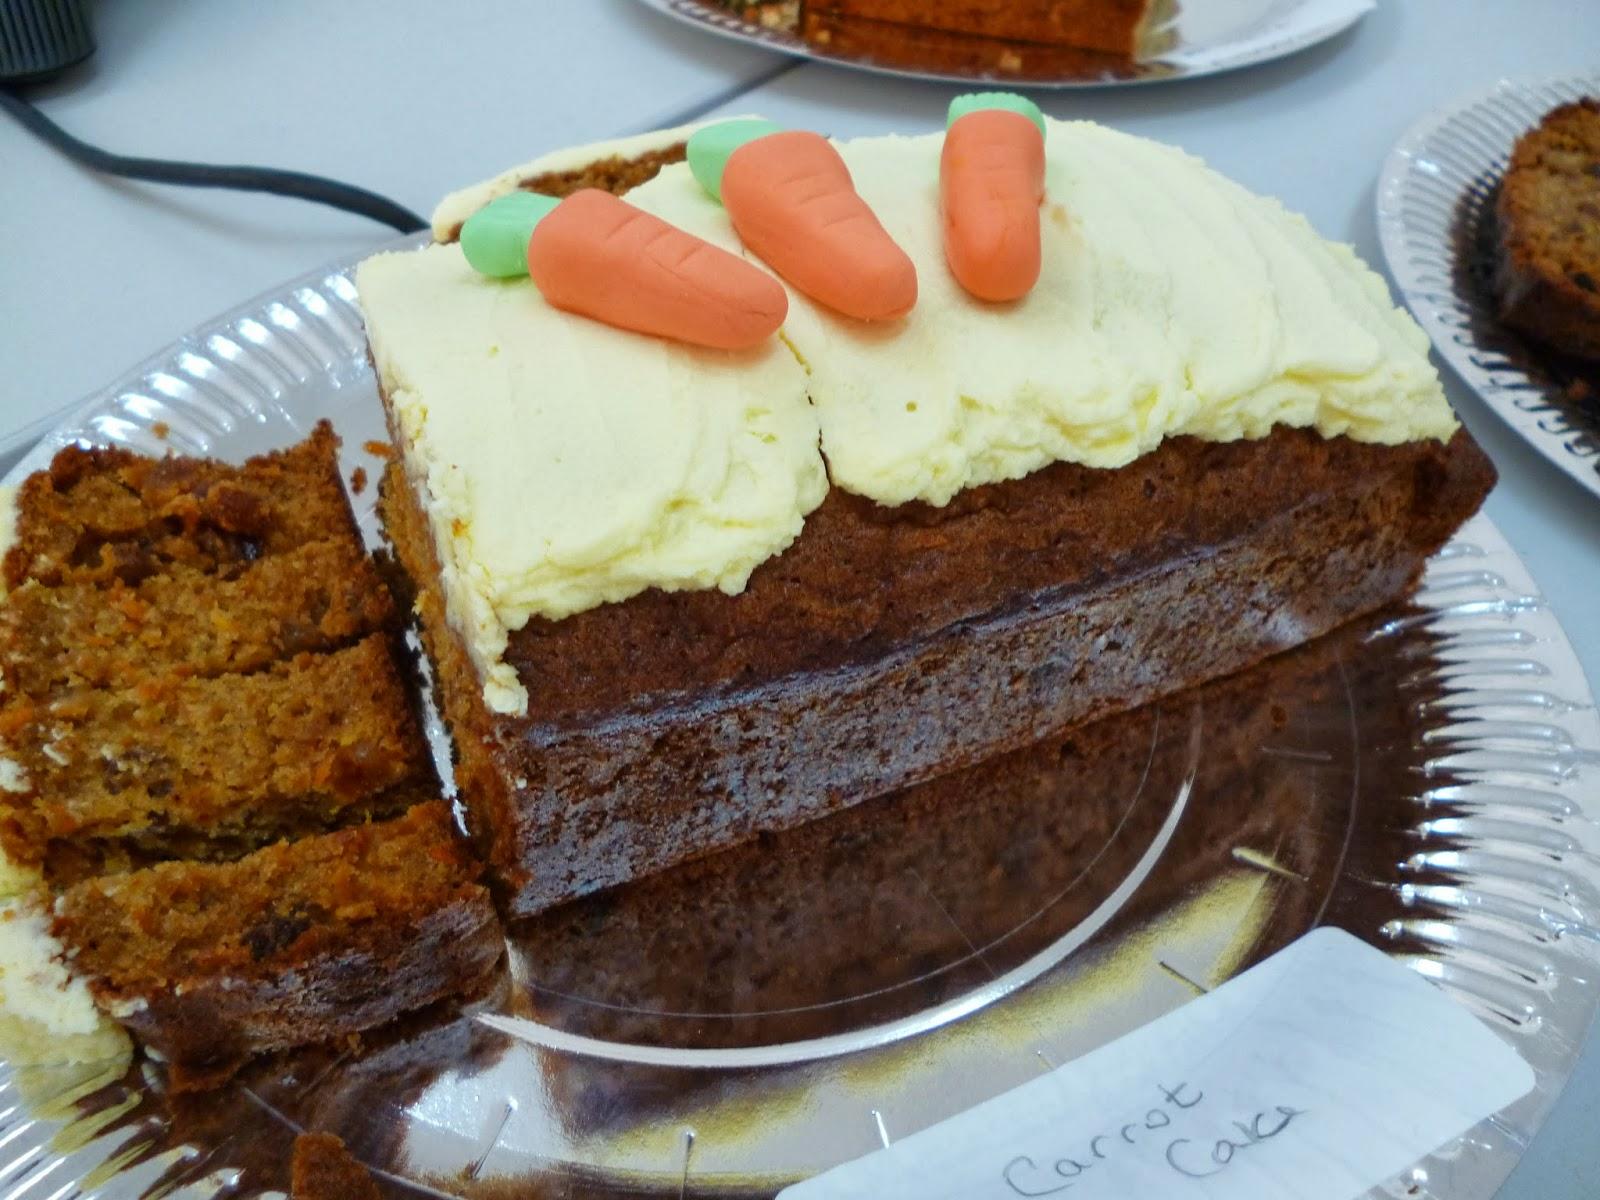 Decorate Carrot Cake